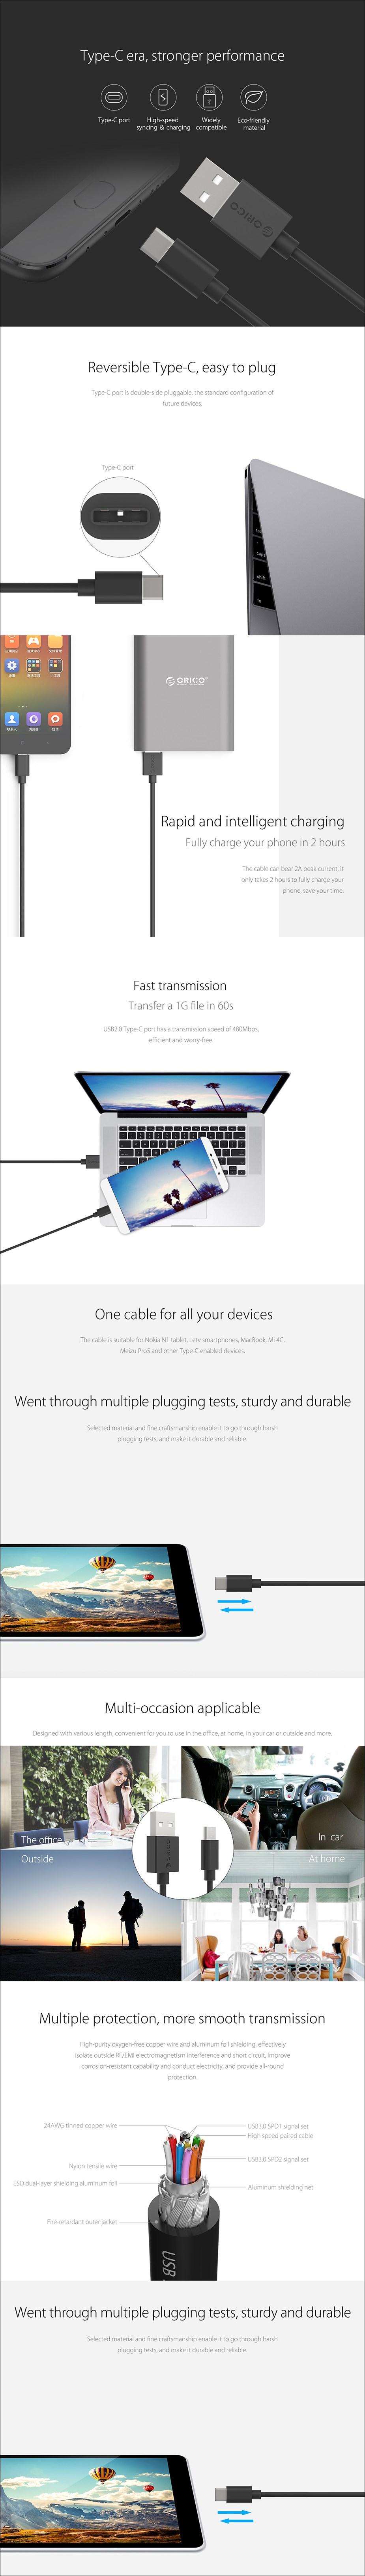 orico_ecu15_1m_usb_typea_to_typec_charge_sync_cable_white_ac31896.jpg